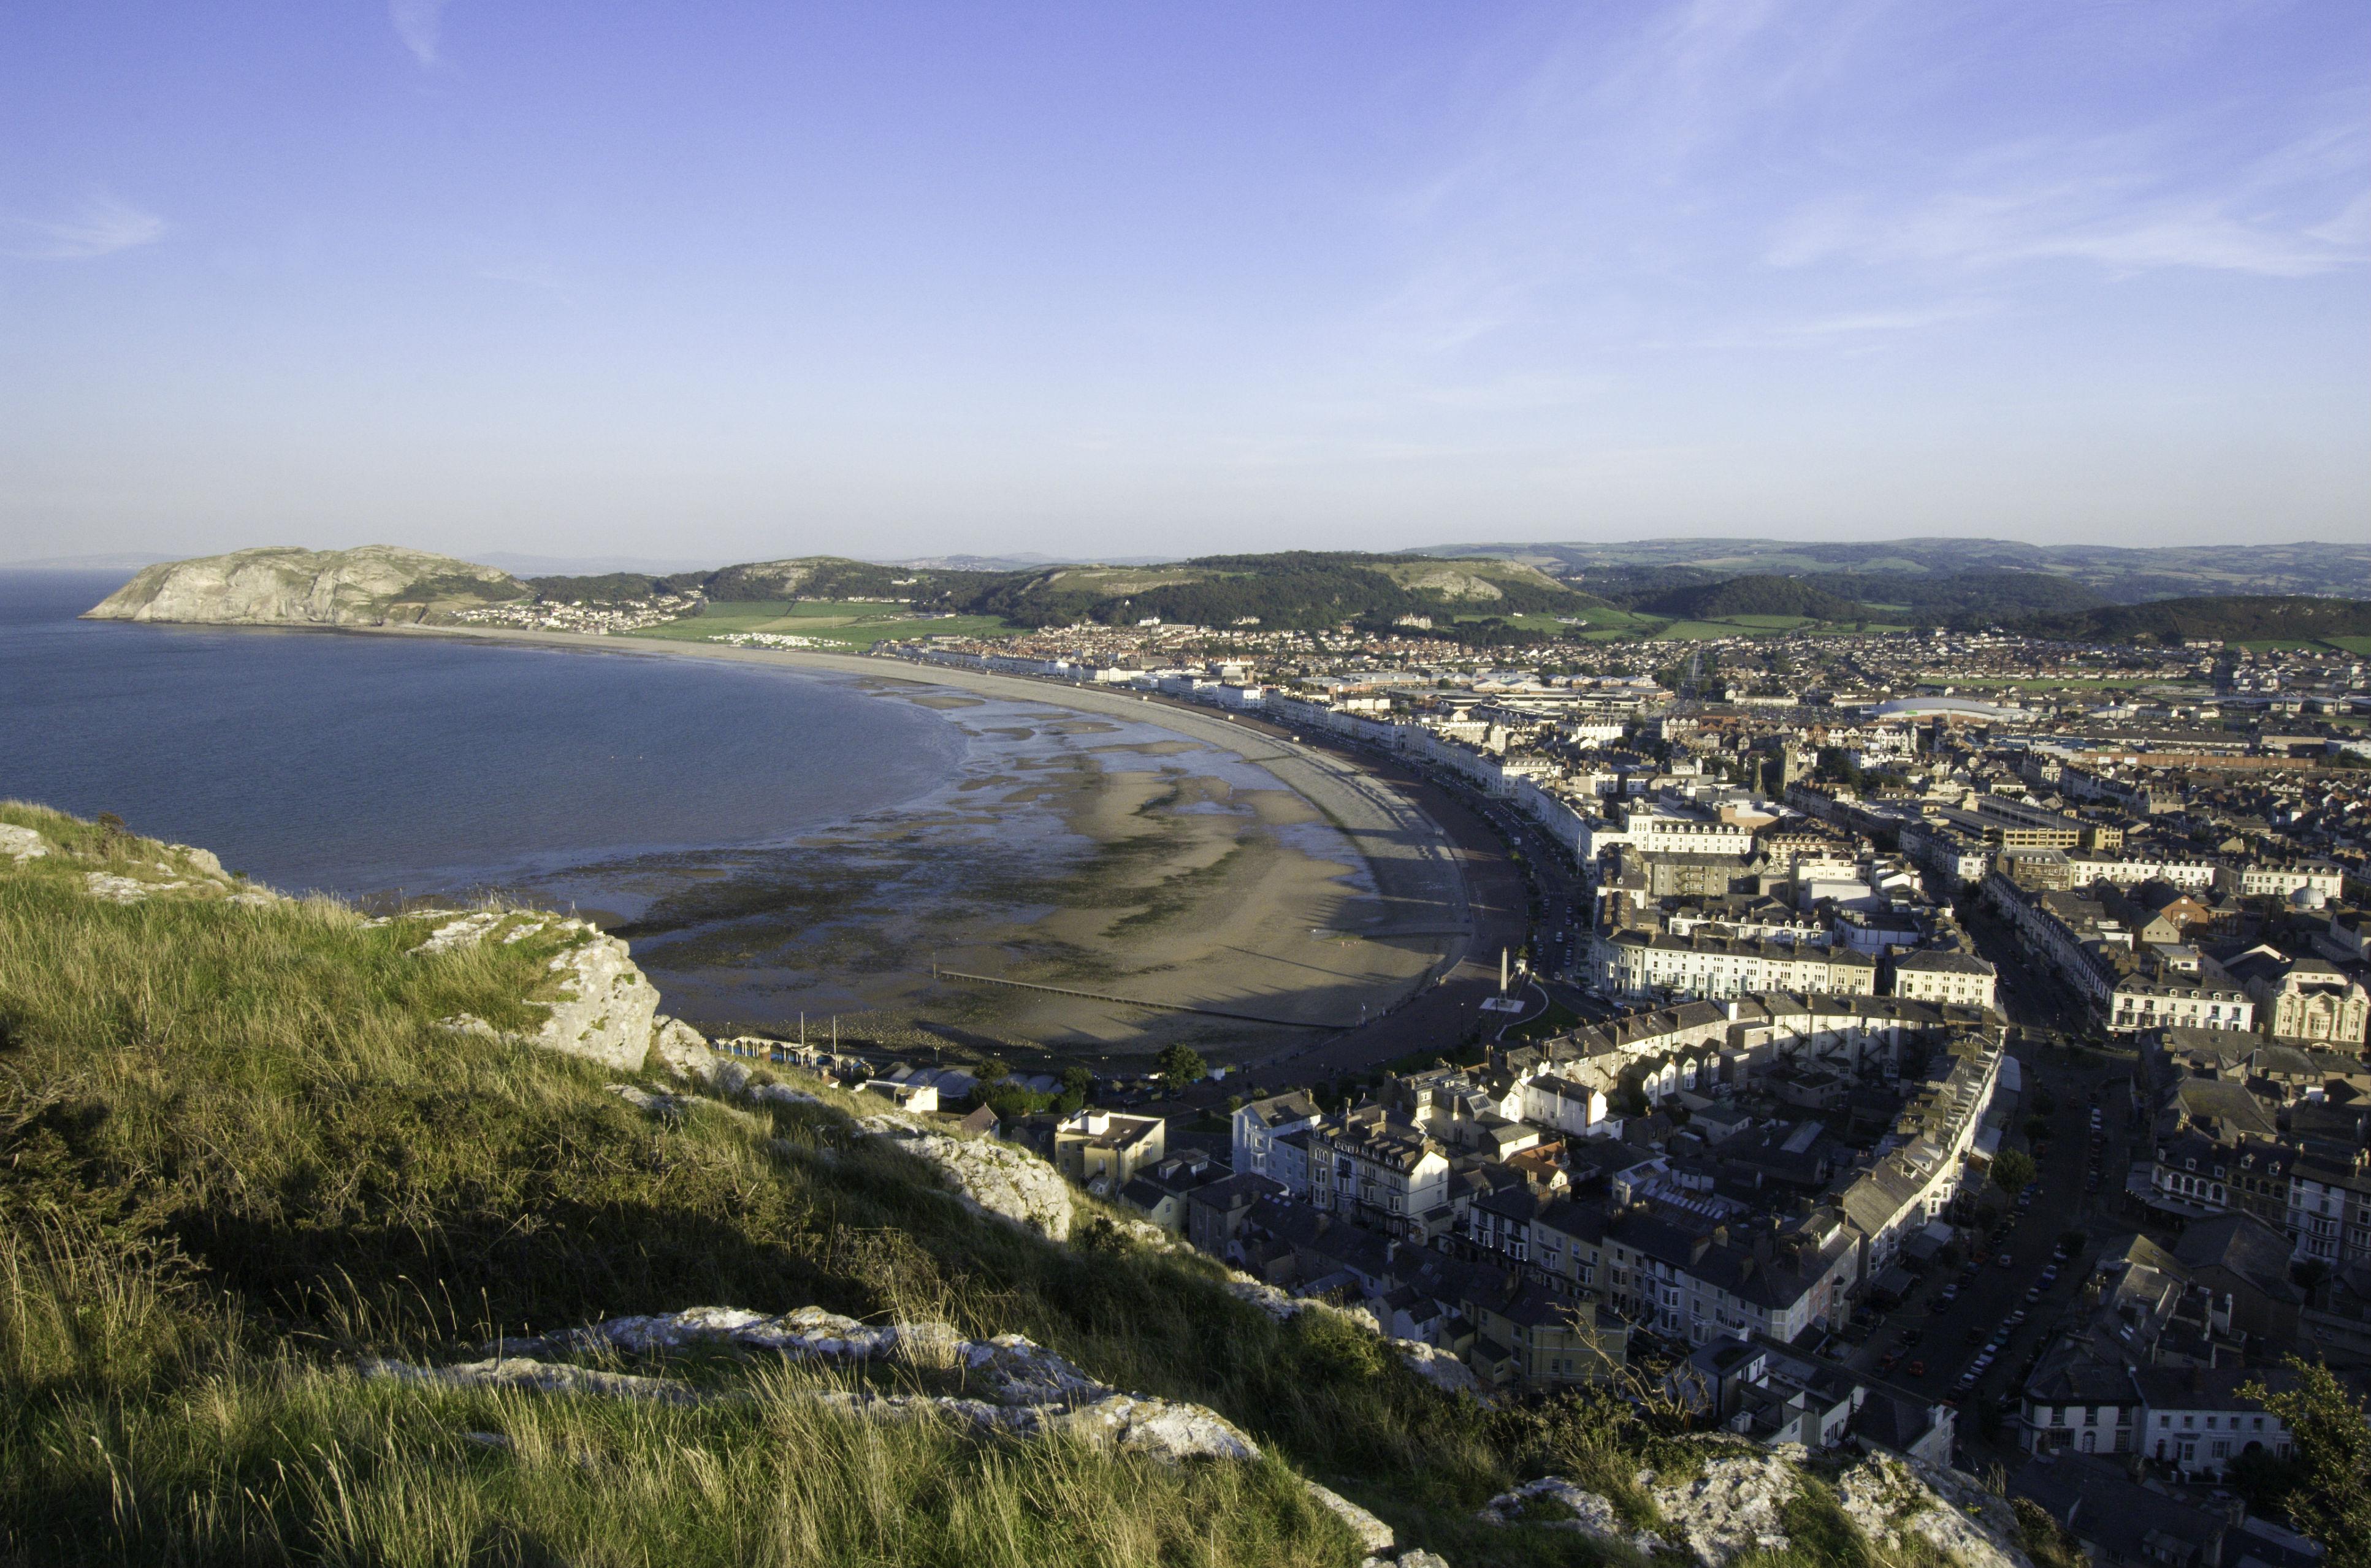 Llandudno ariel view coastal seaside town North Wales Coast